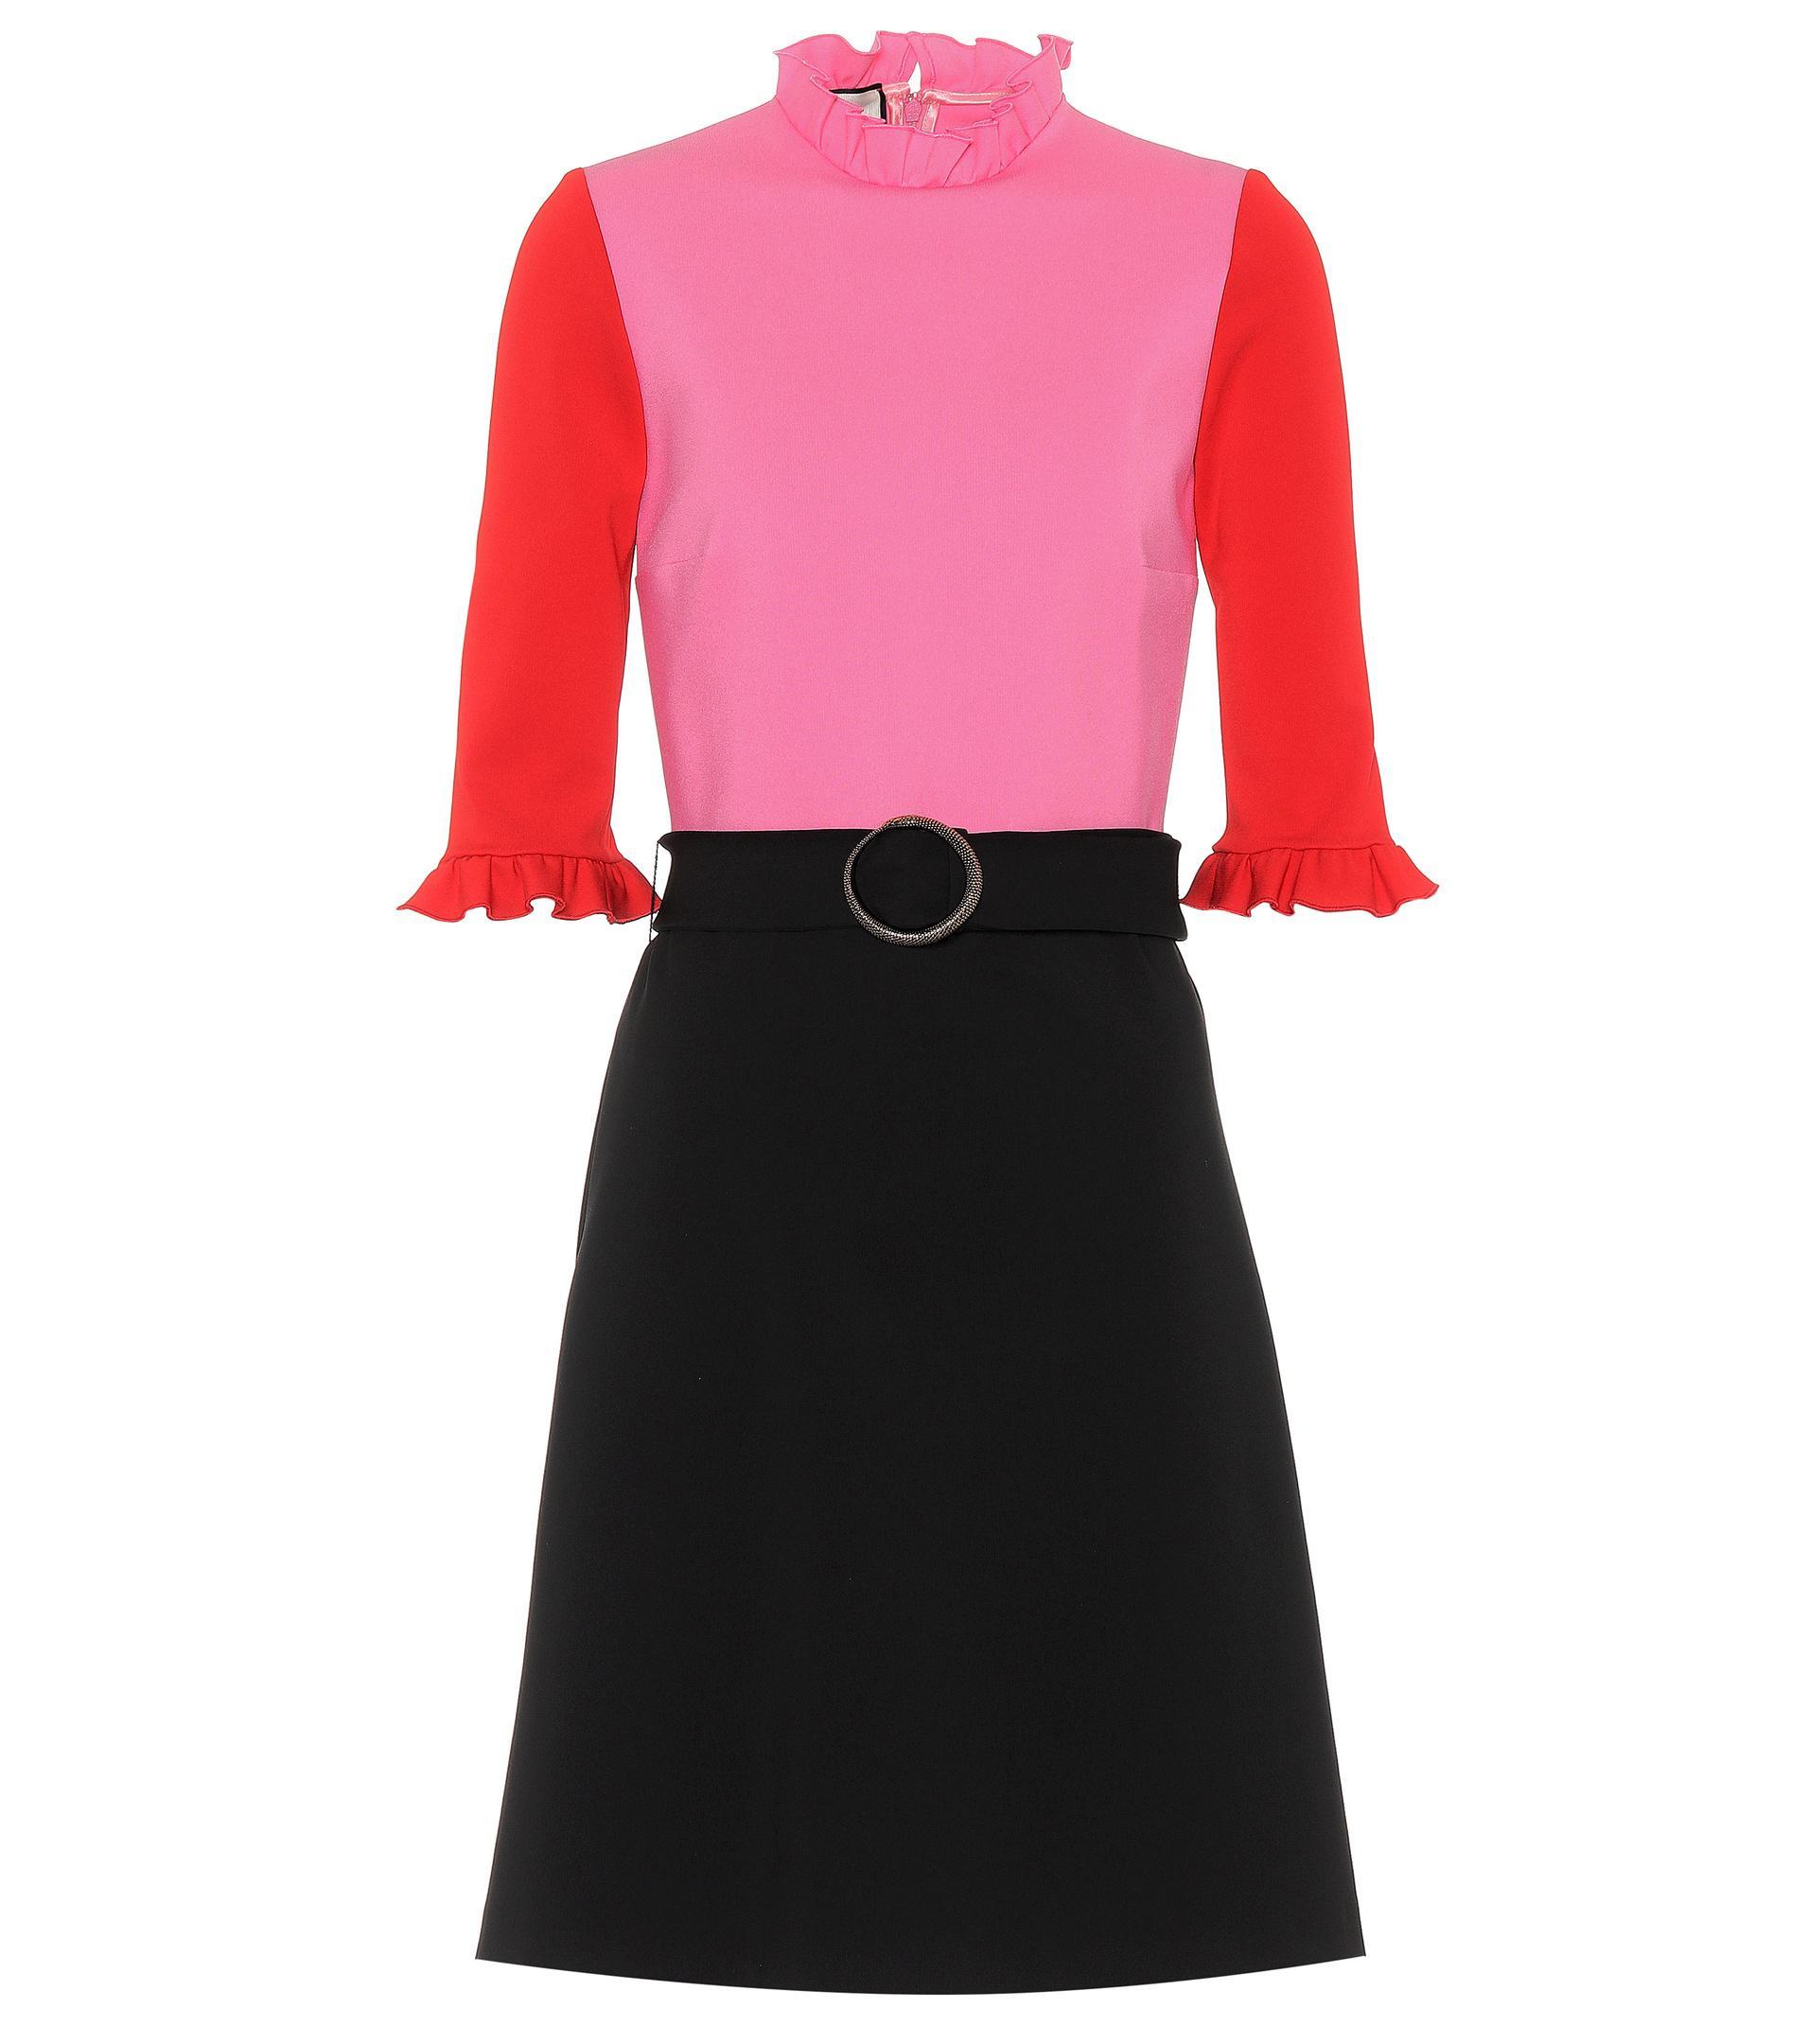 Lyst - Robe à volants Gucci en coloris Rose fbeaf93efc6